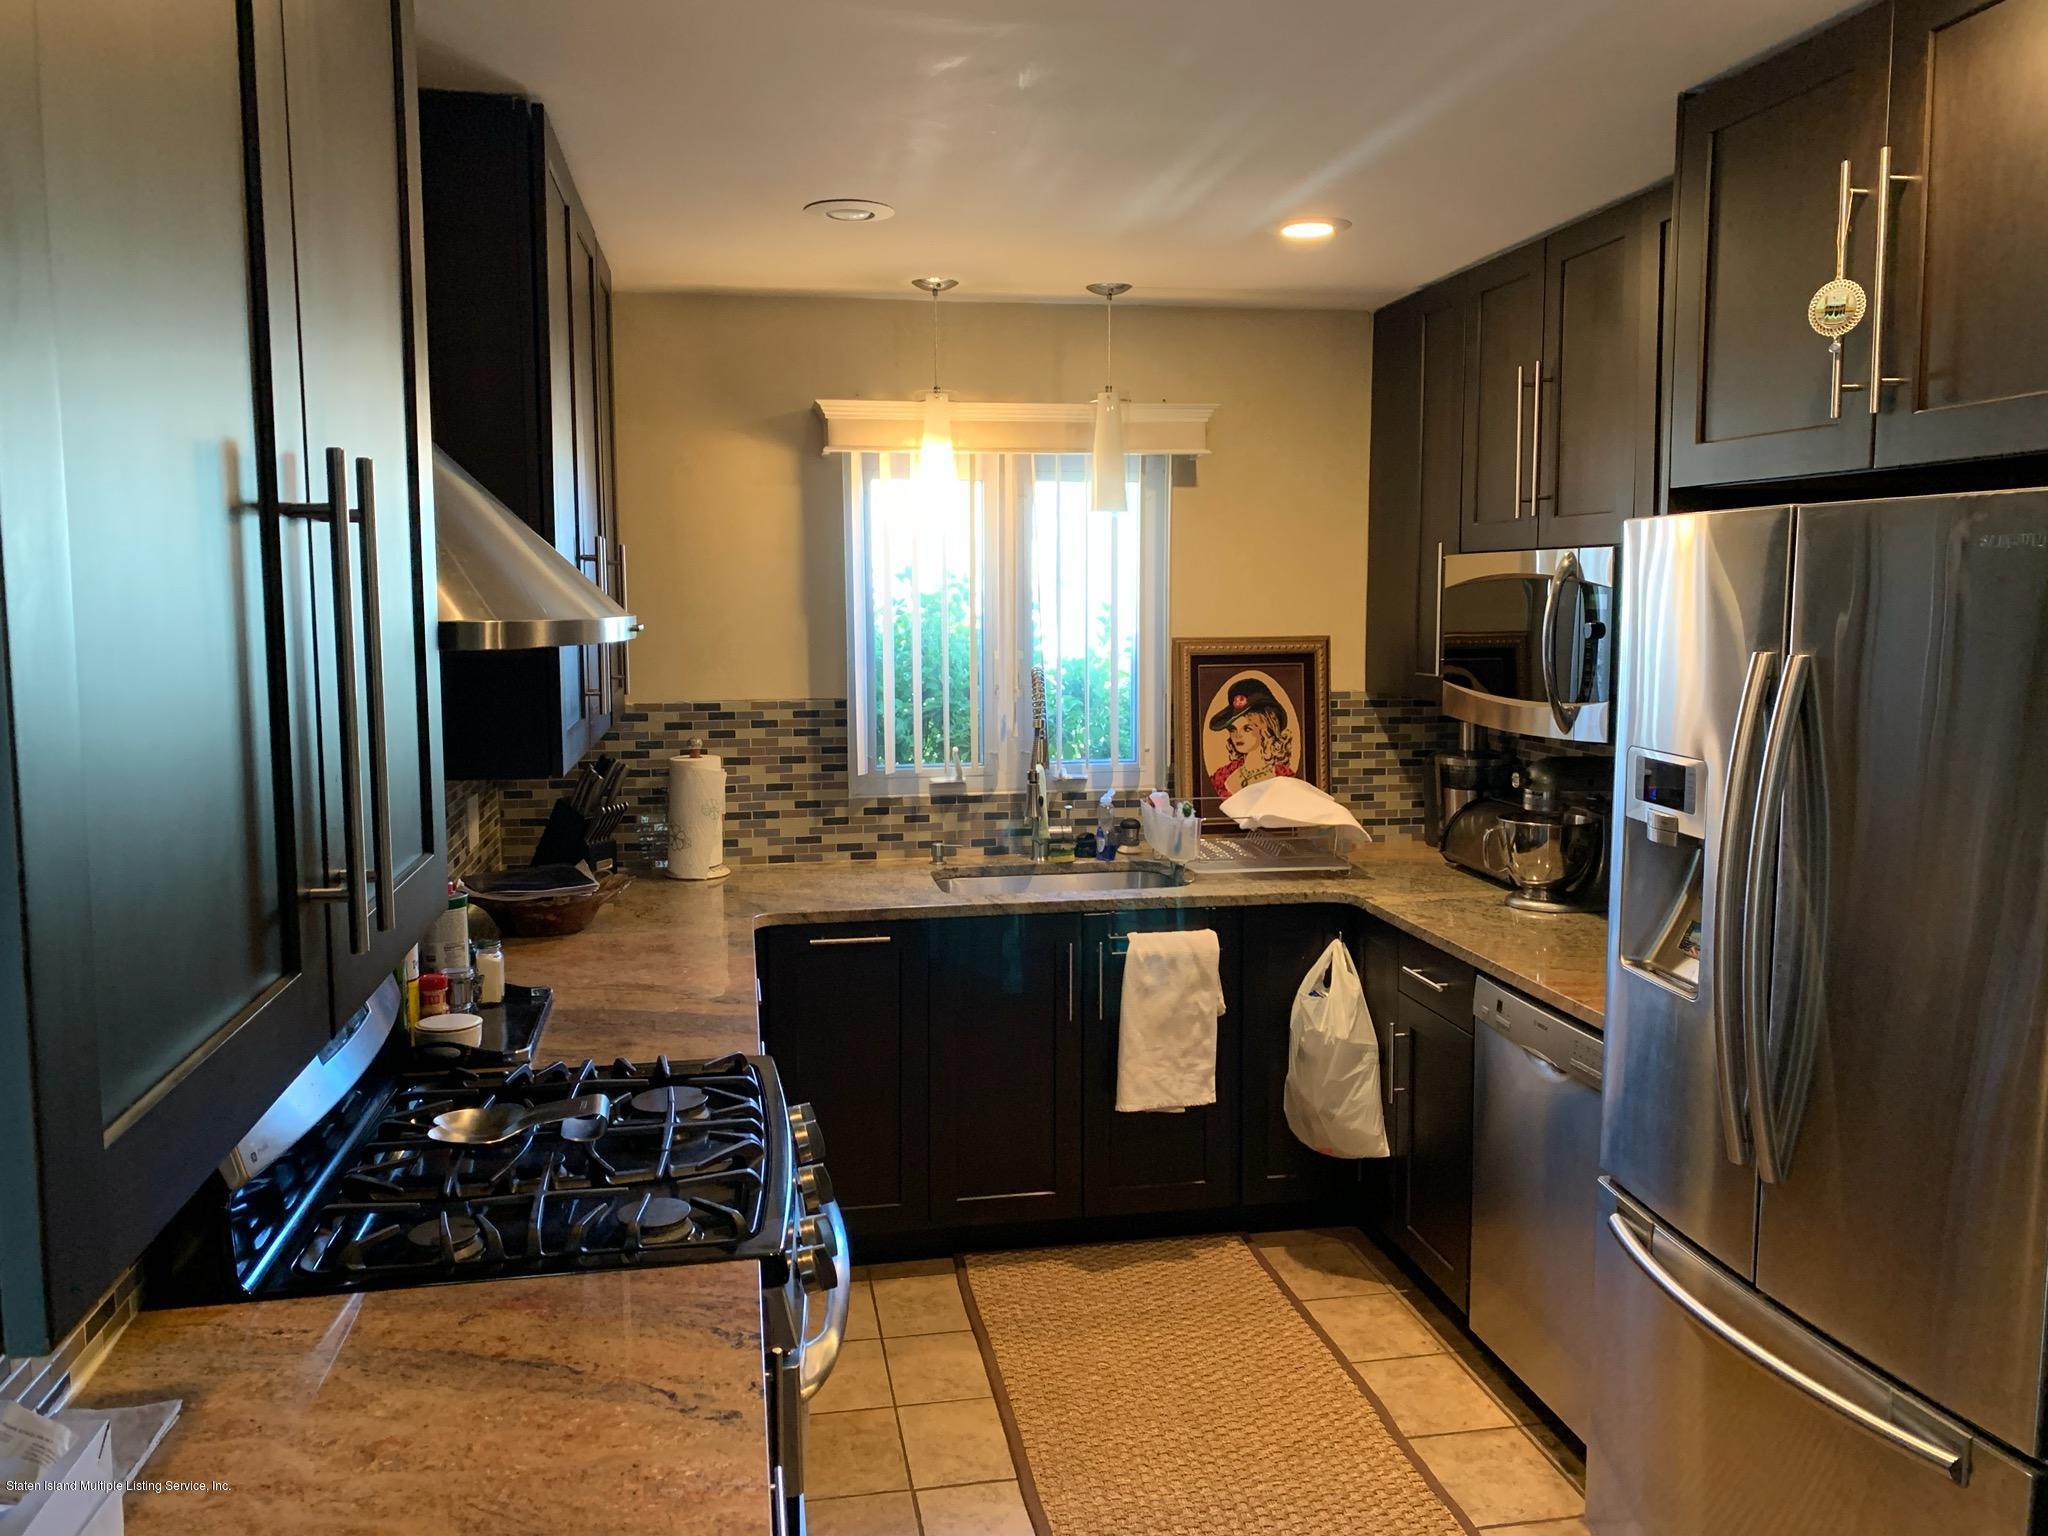 Single Family - Detached 58 Guyon Avenue  Staten Island, NY 10306, MLS-1135873-5